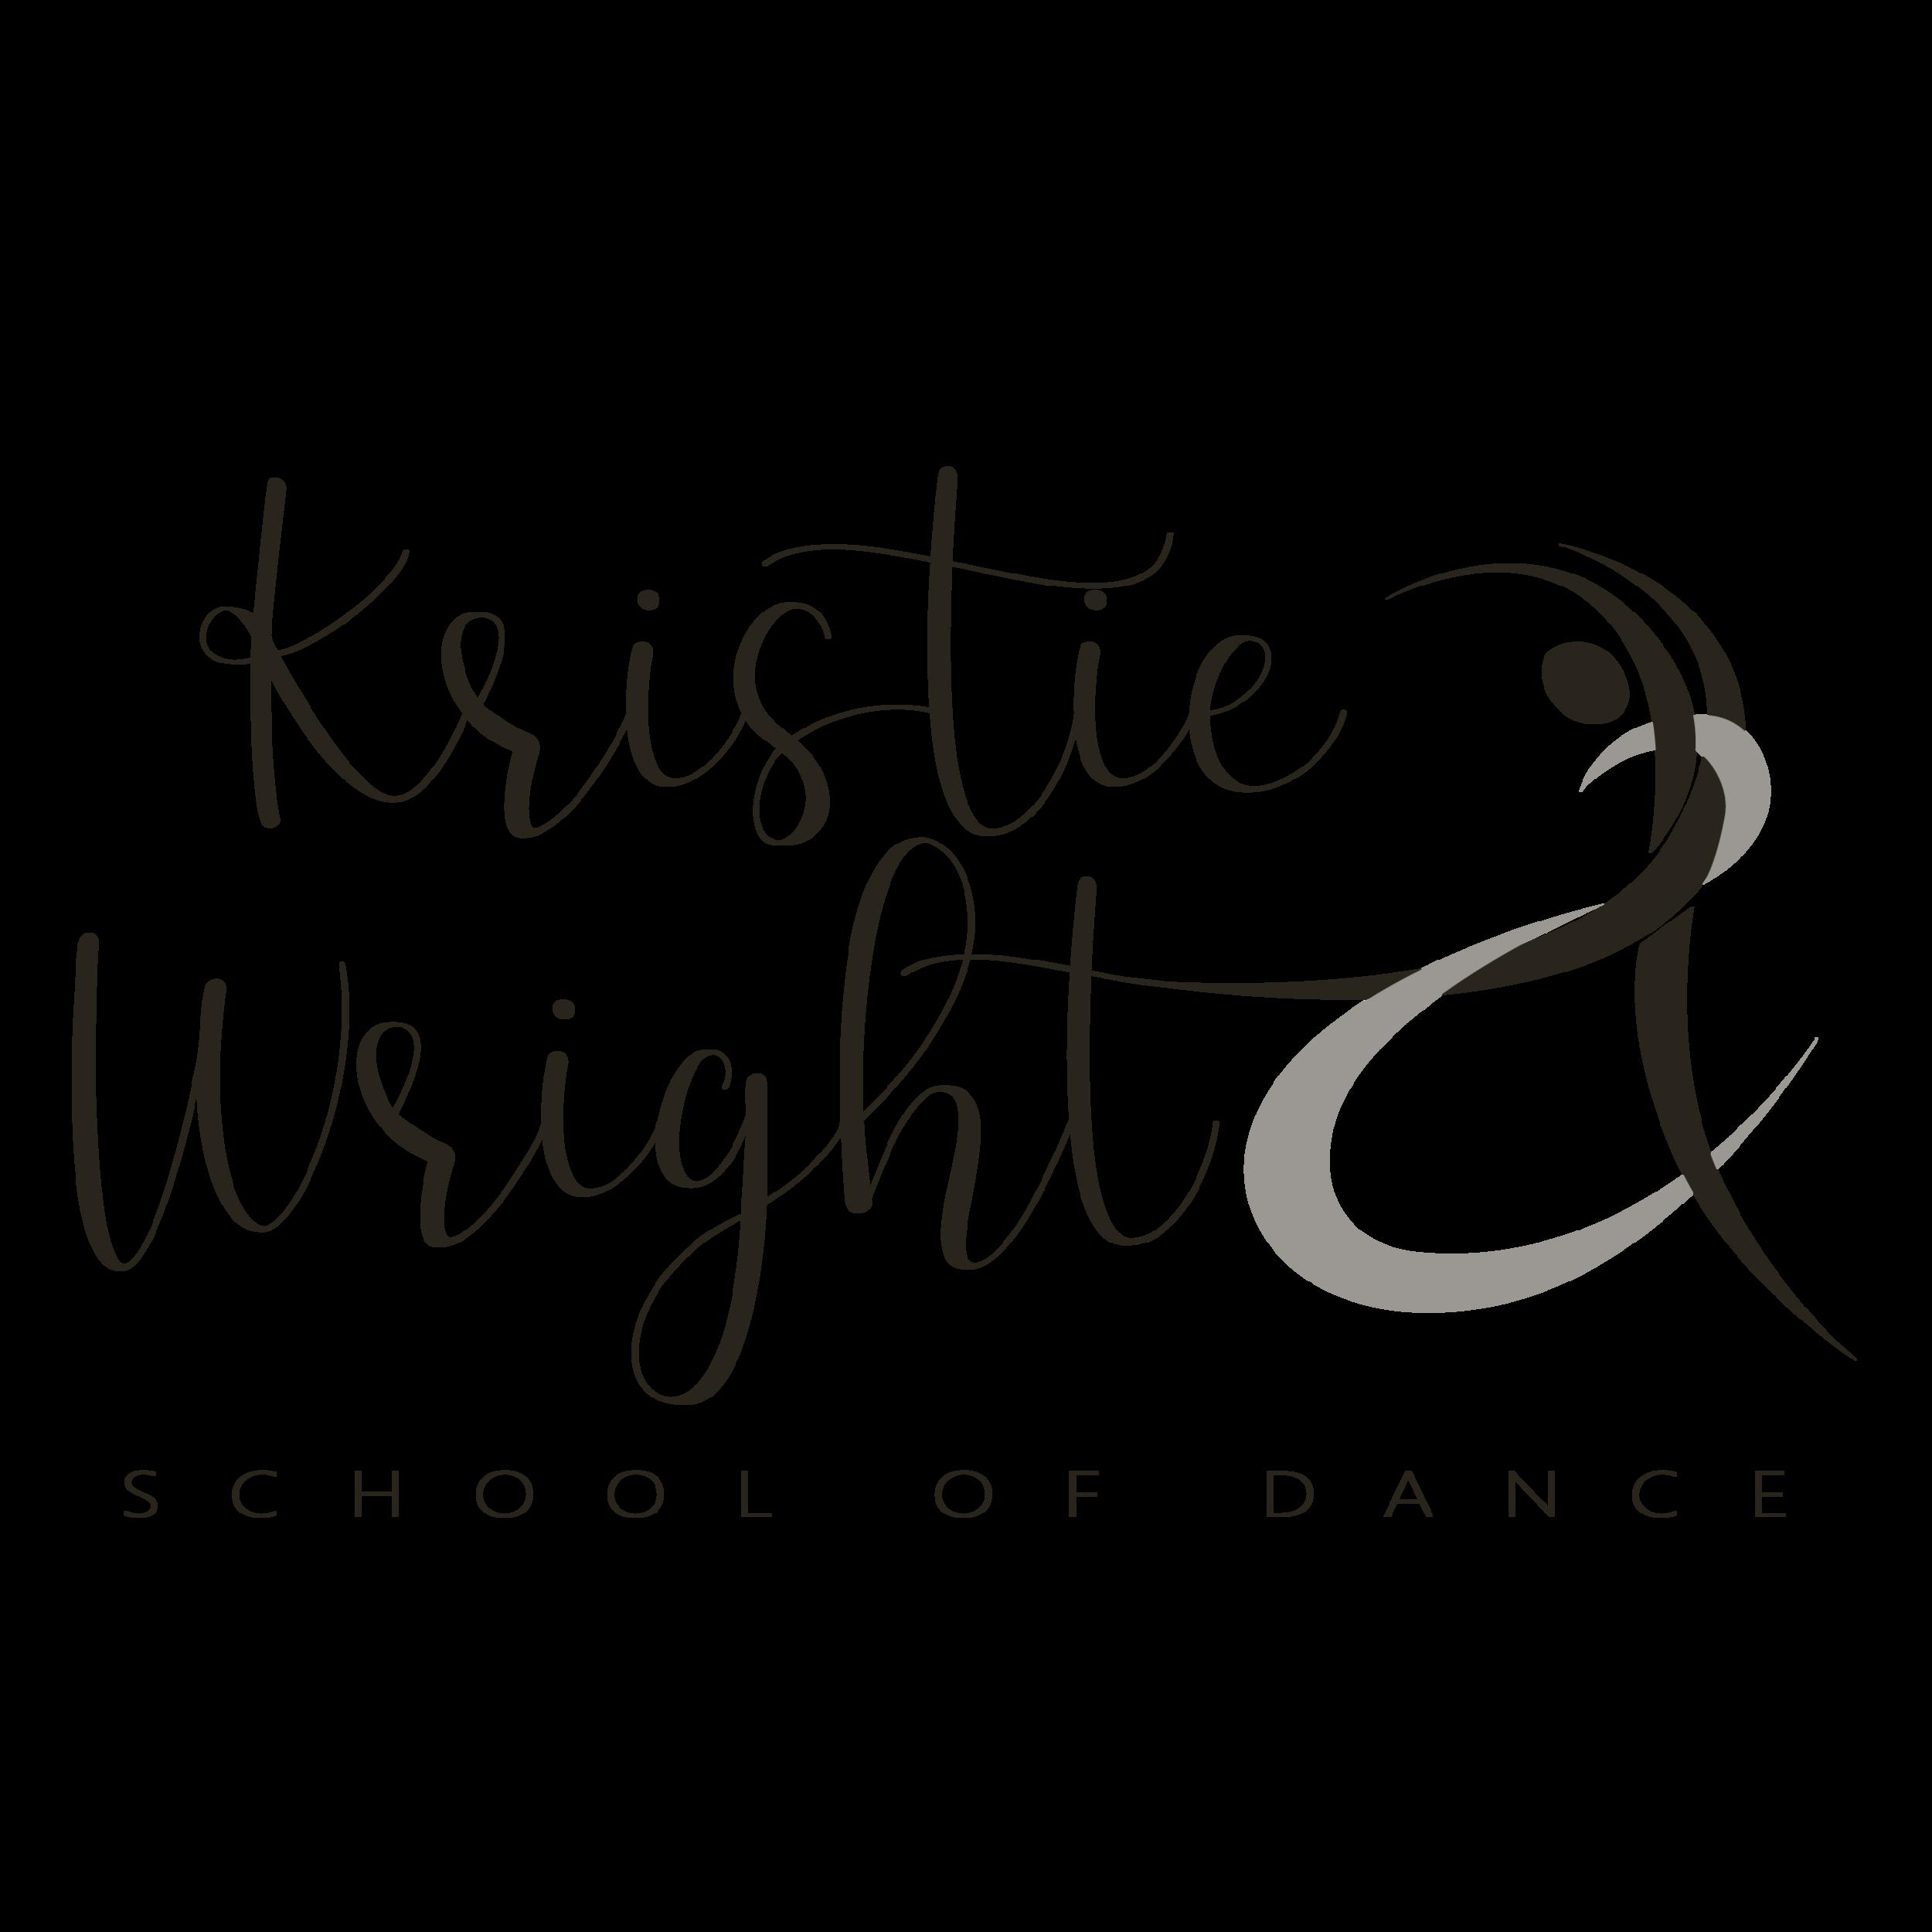 Kristie Wright School of Dance